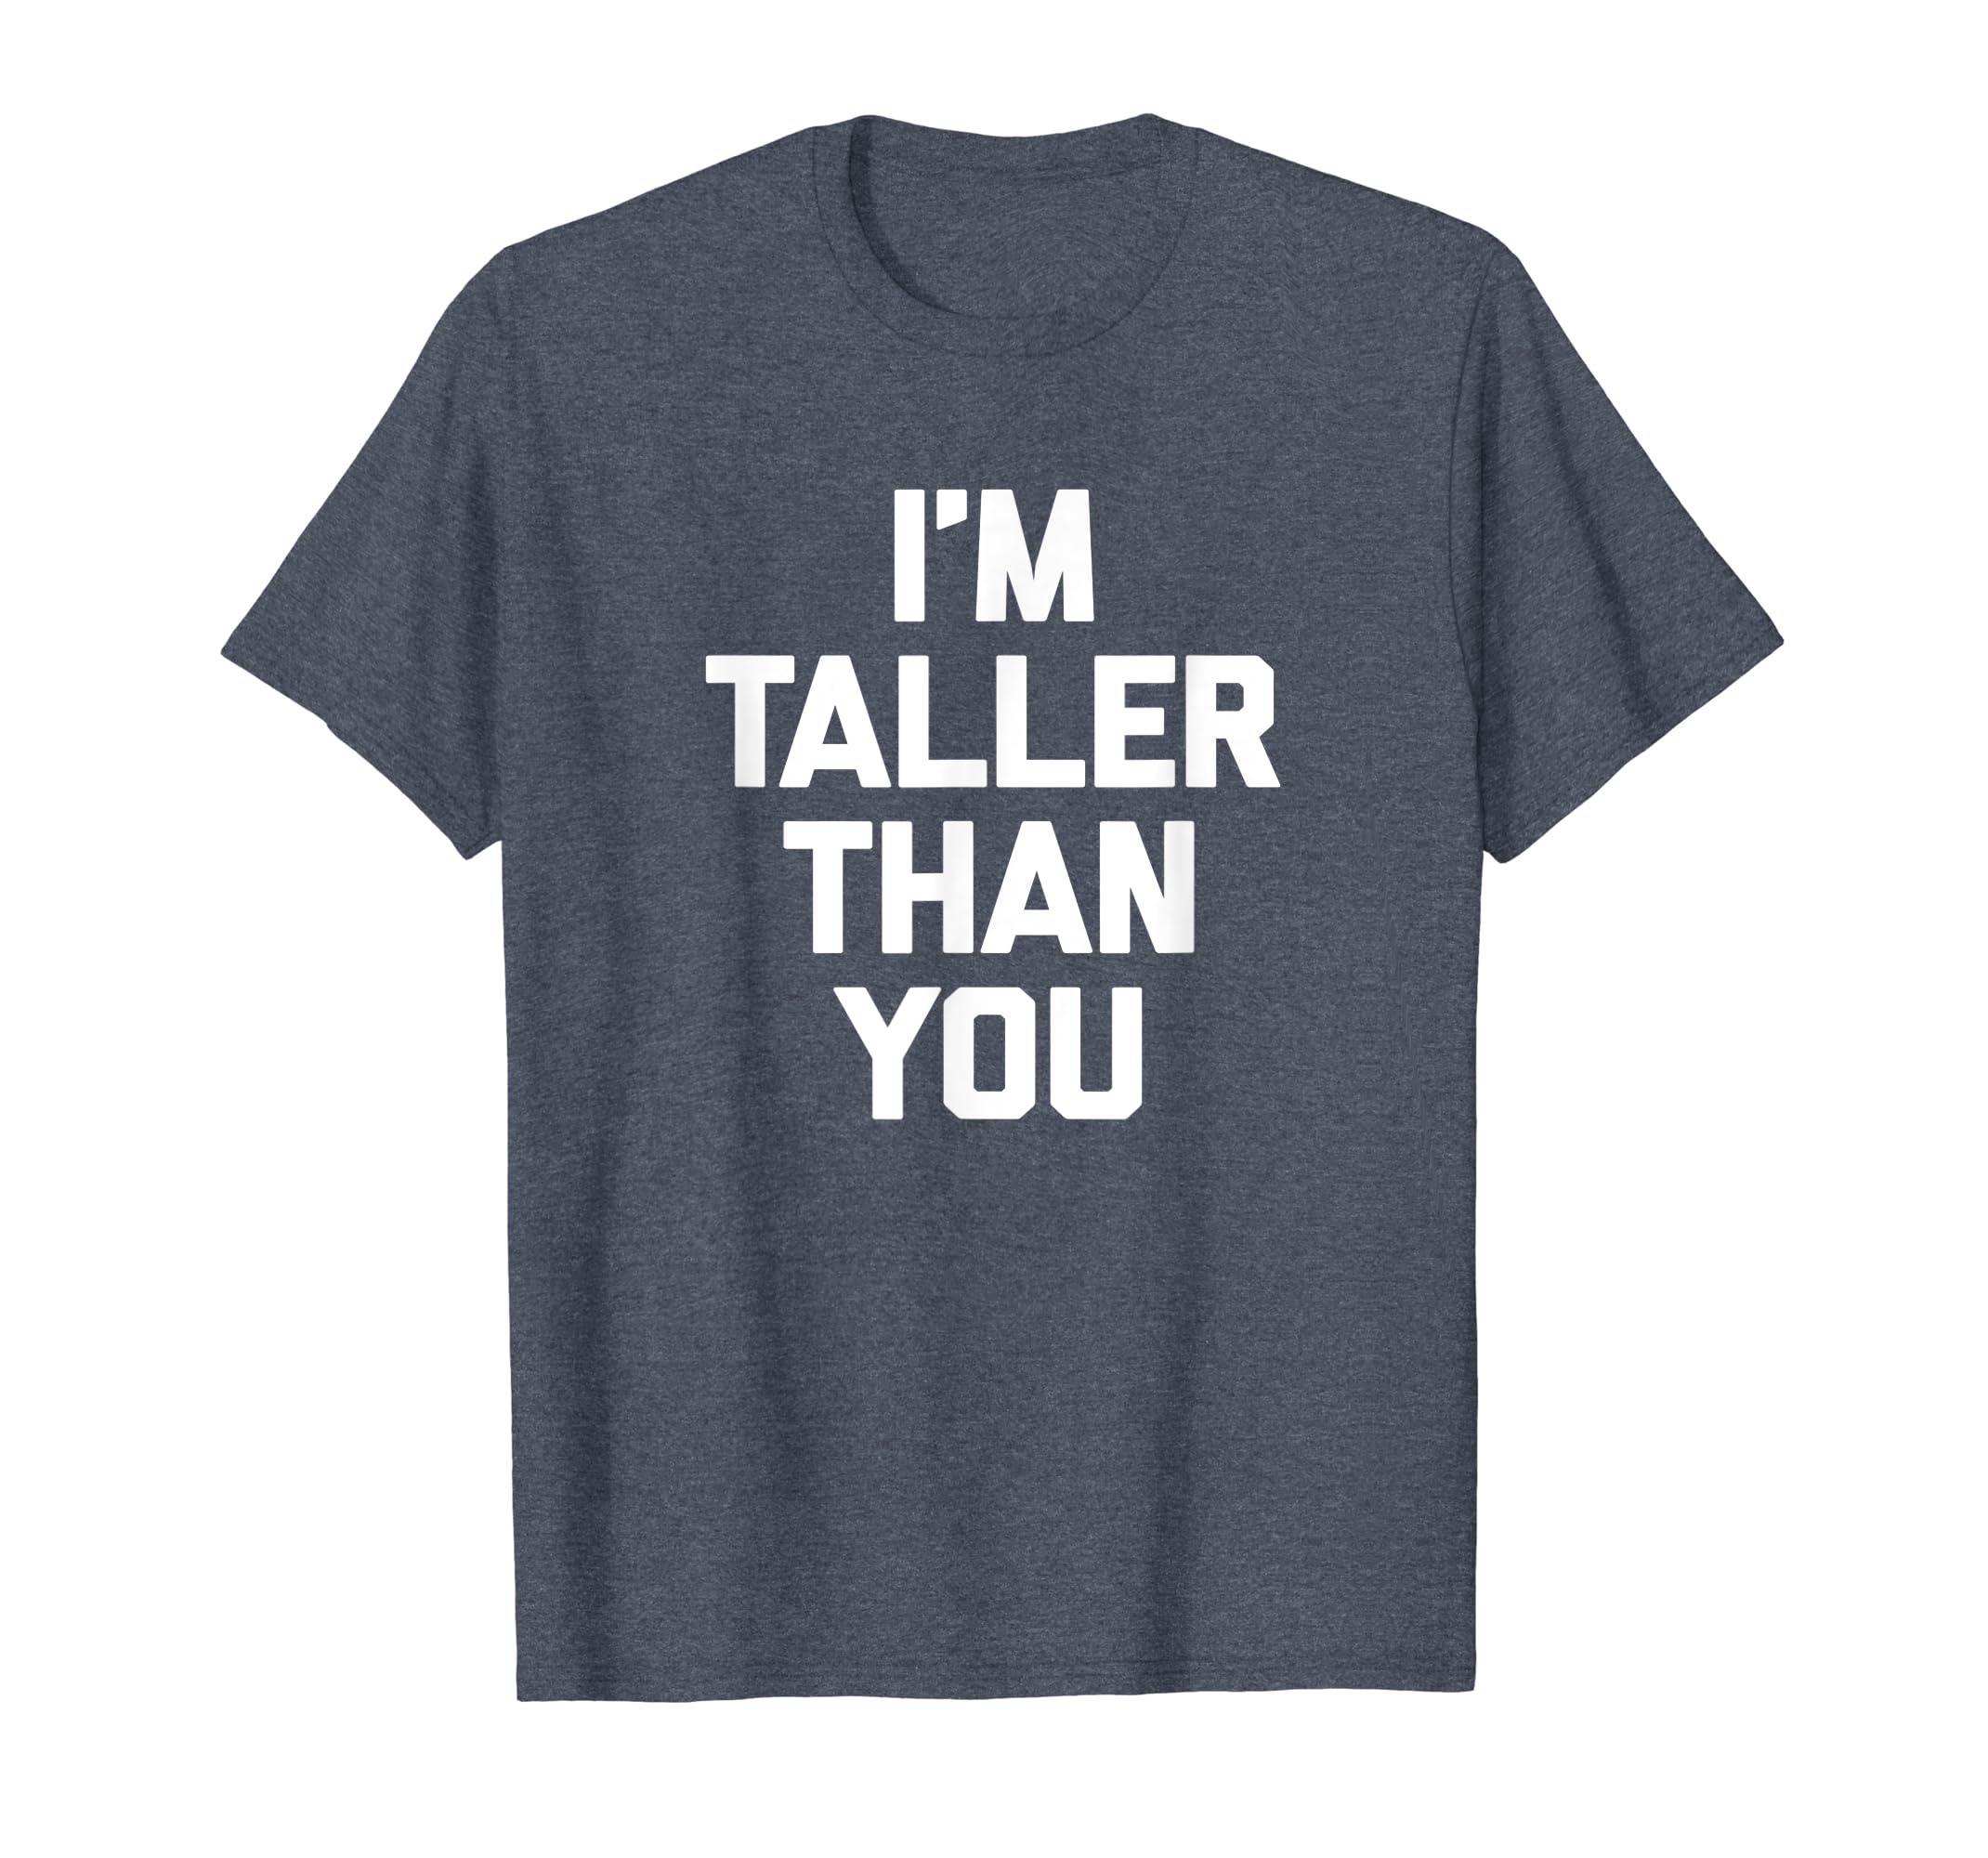 4534315e Amazon.com: I'm Taller Than You T-Shirt funny saying sarcastic novelty:  Clothing